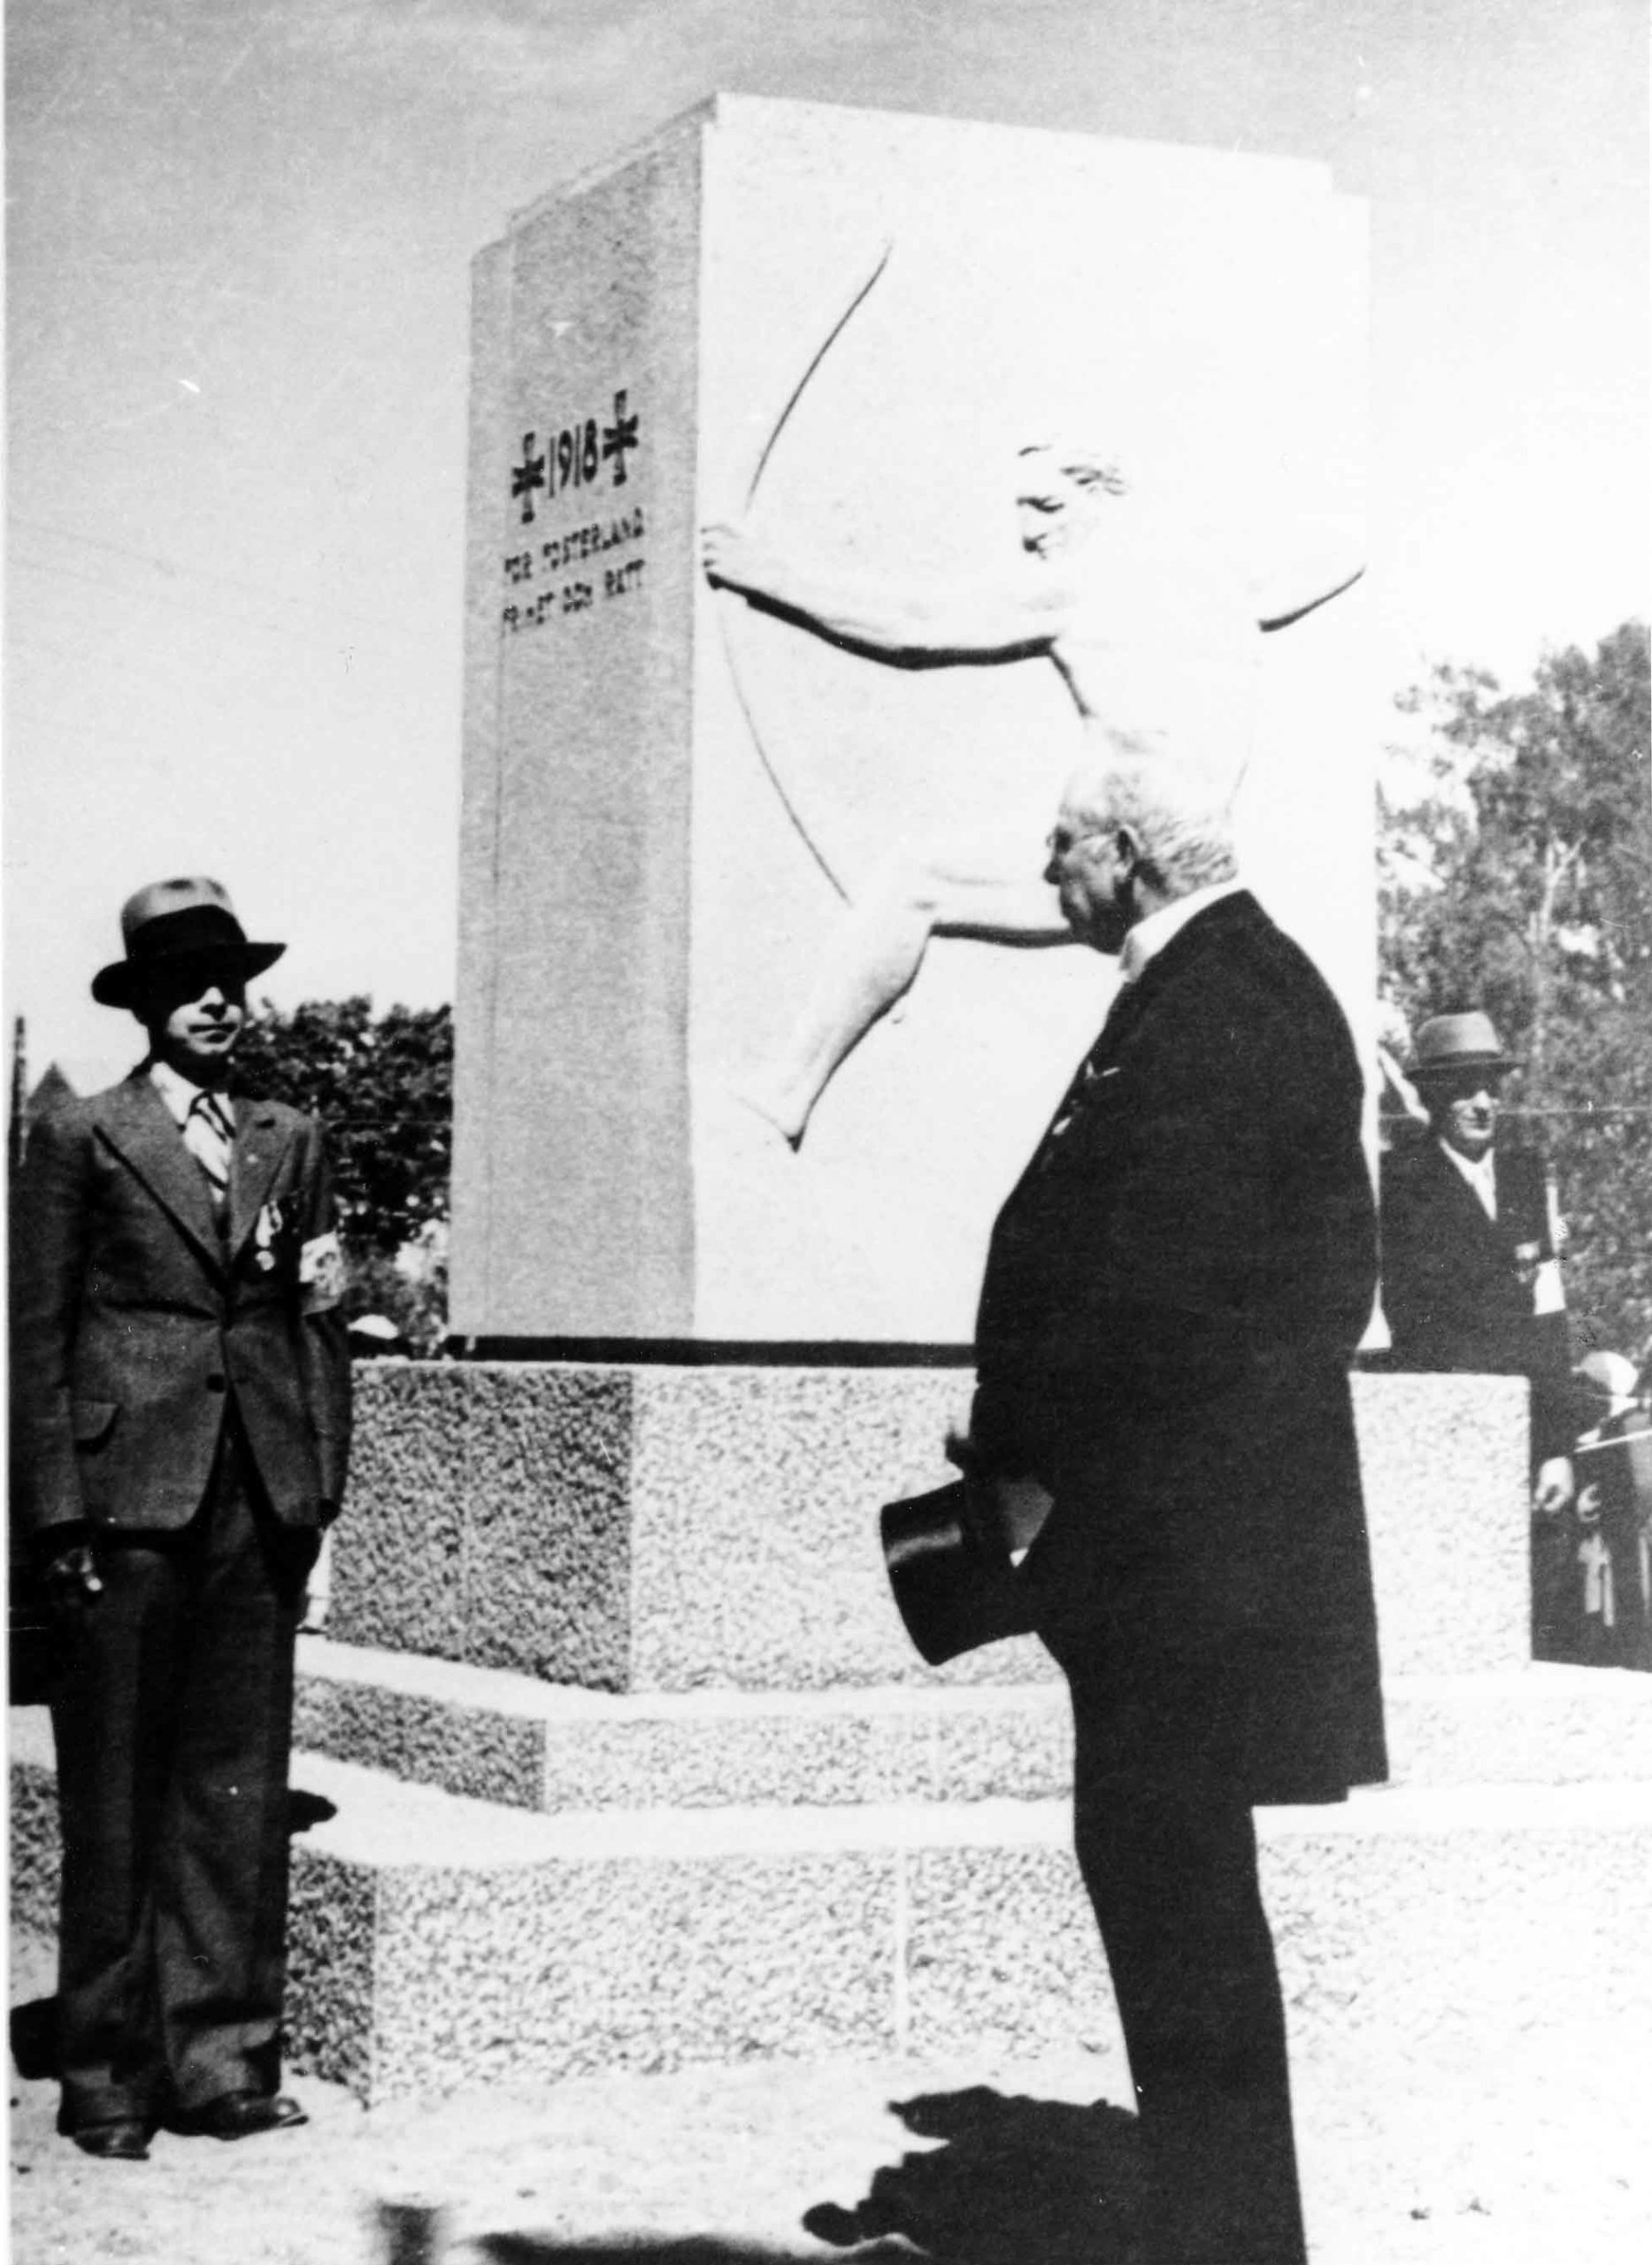 Maakuntaneuvos Carl Björkman puhuu Godbyssä 1938.